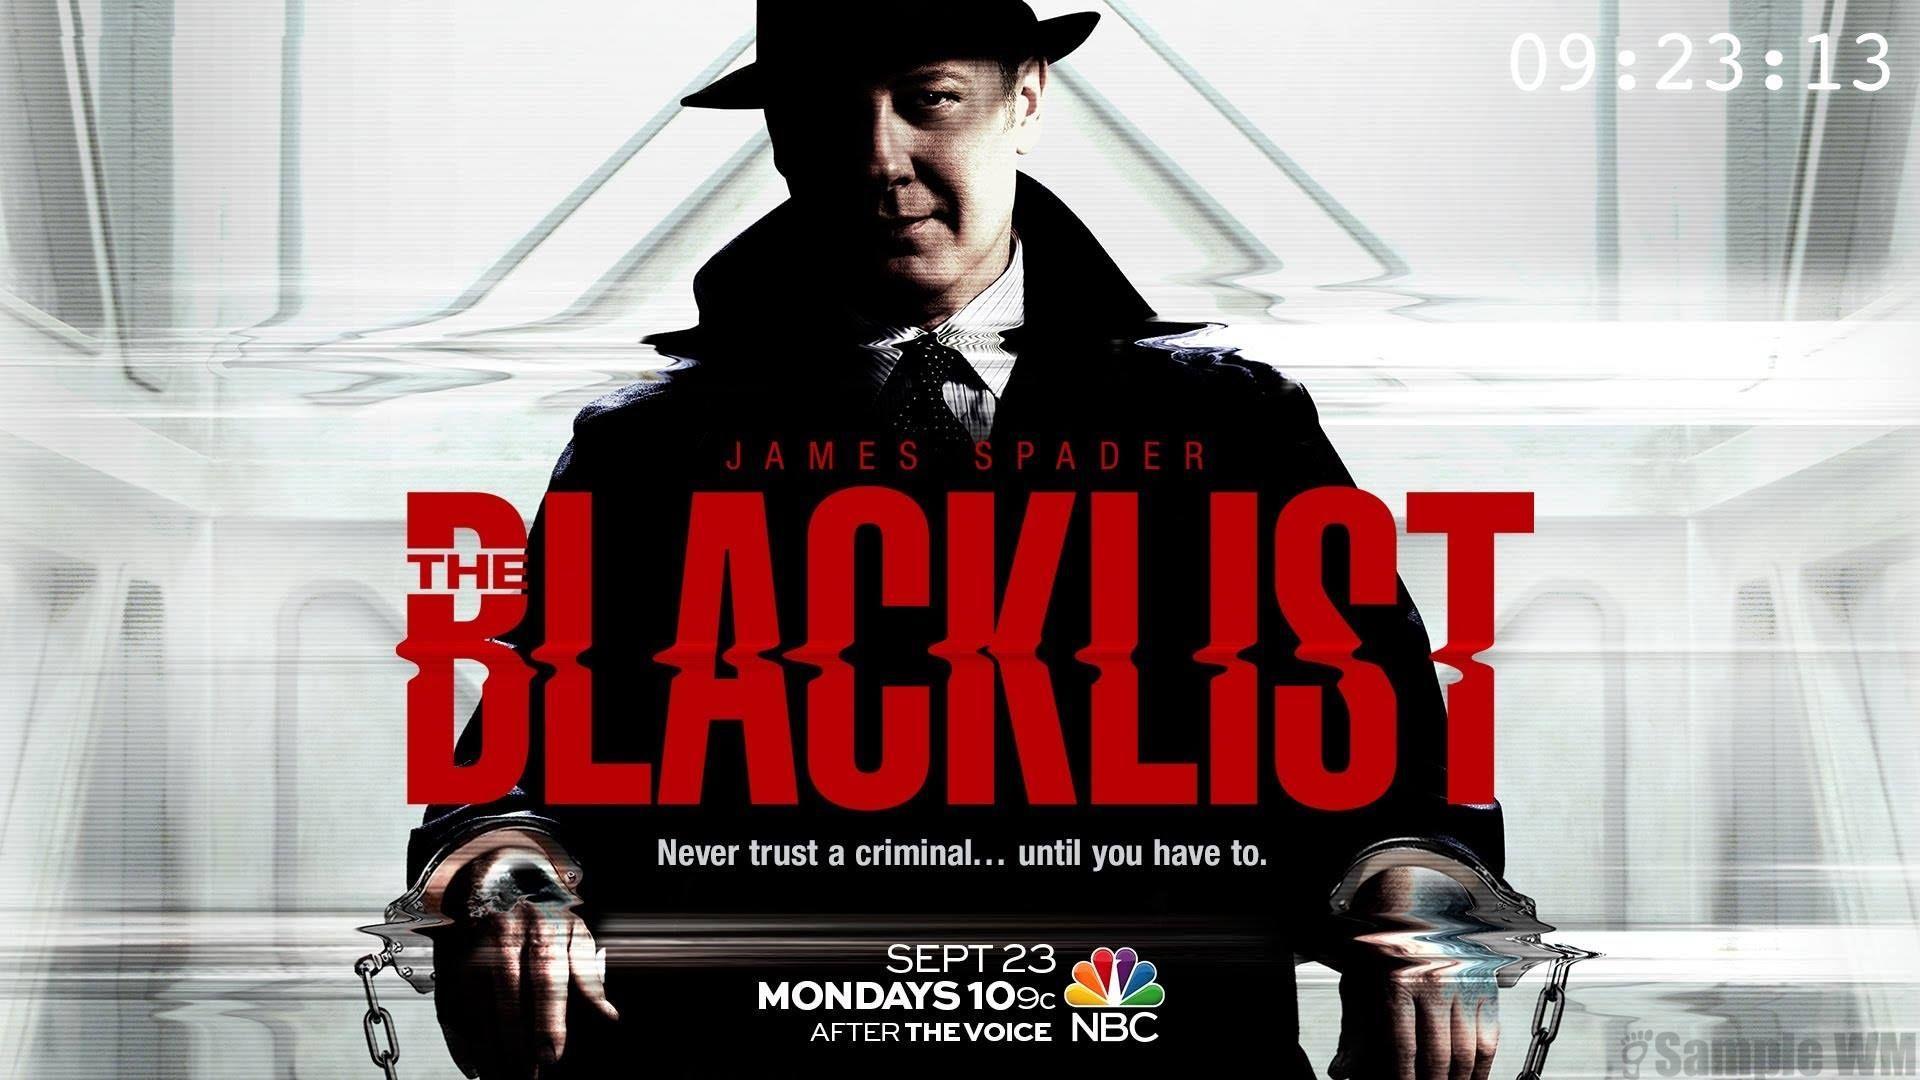 The Blacklist - The Blacklist Wallpaper (35676705) - Fanpop